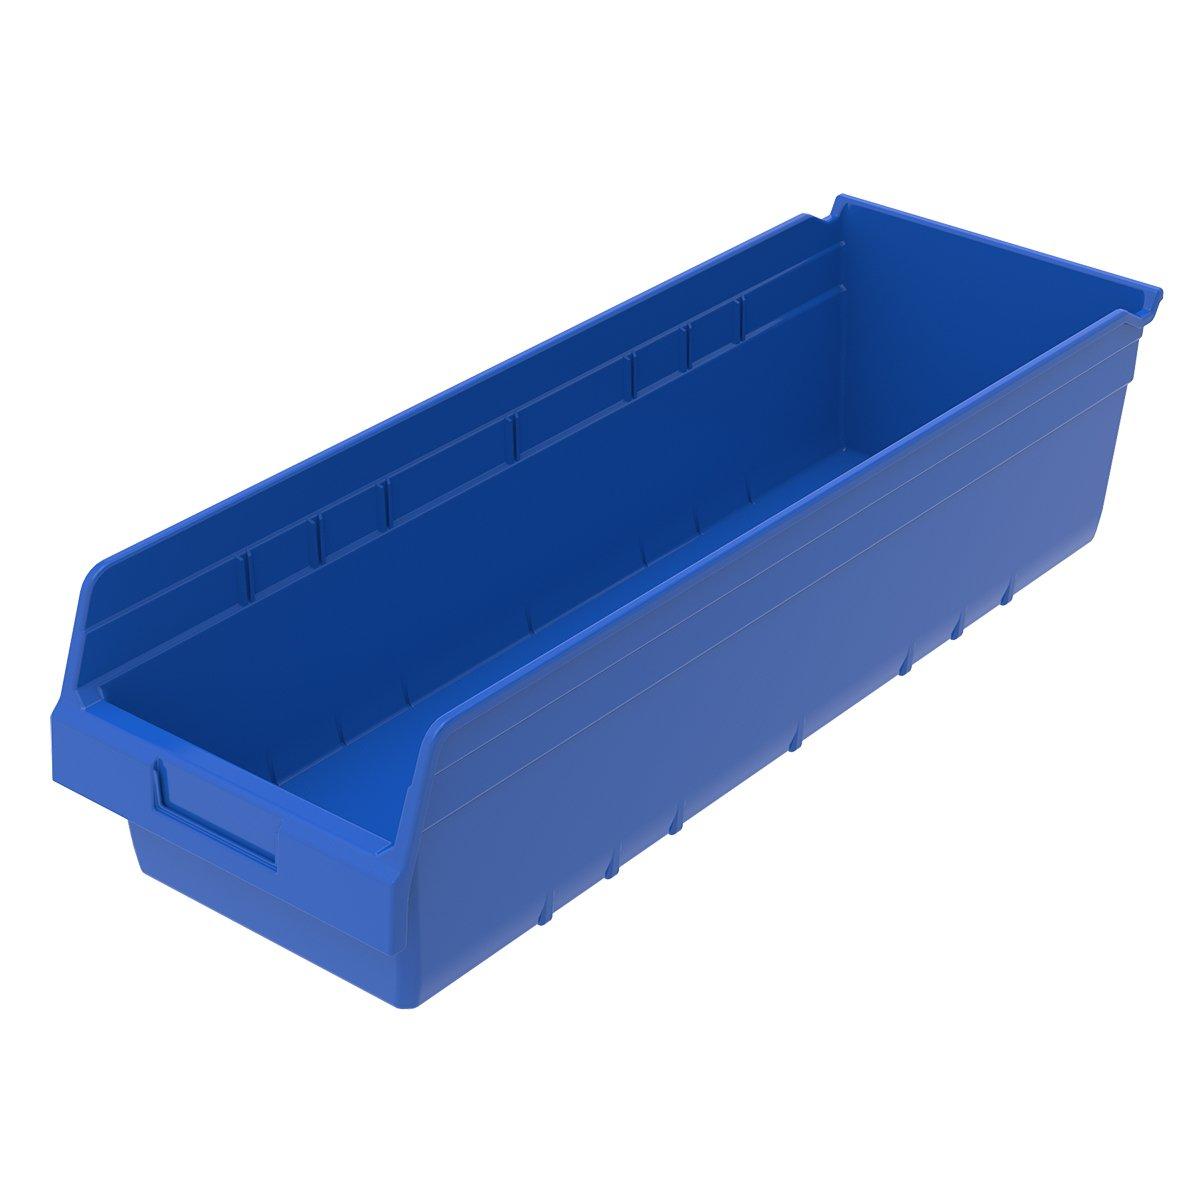 Akro-Mils 30084BLUE ShelfMax Plastic Nesting Shelf Bin Box, 23-5/8-Inch L x 8-3/8-Inch W x 6-Inch H,  Blue,  6-Pack